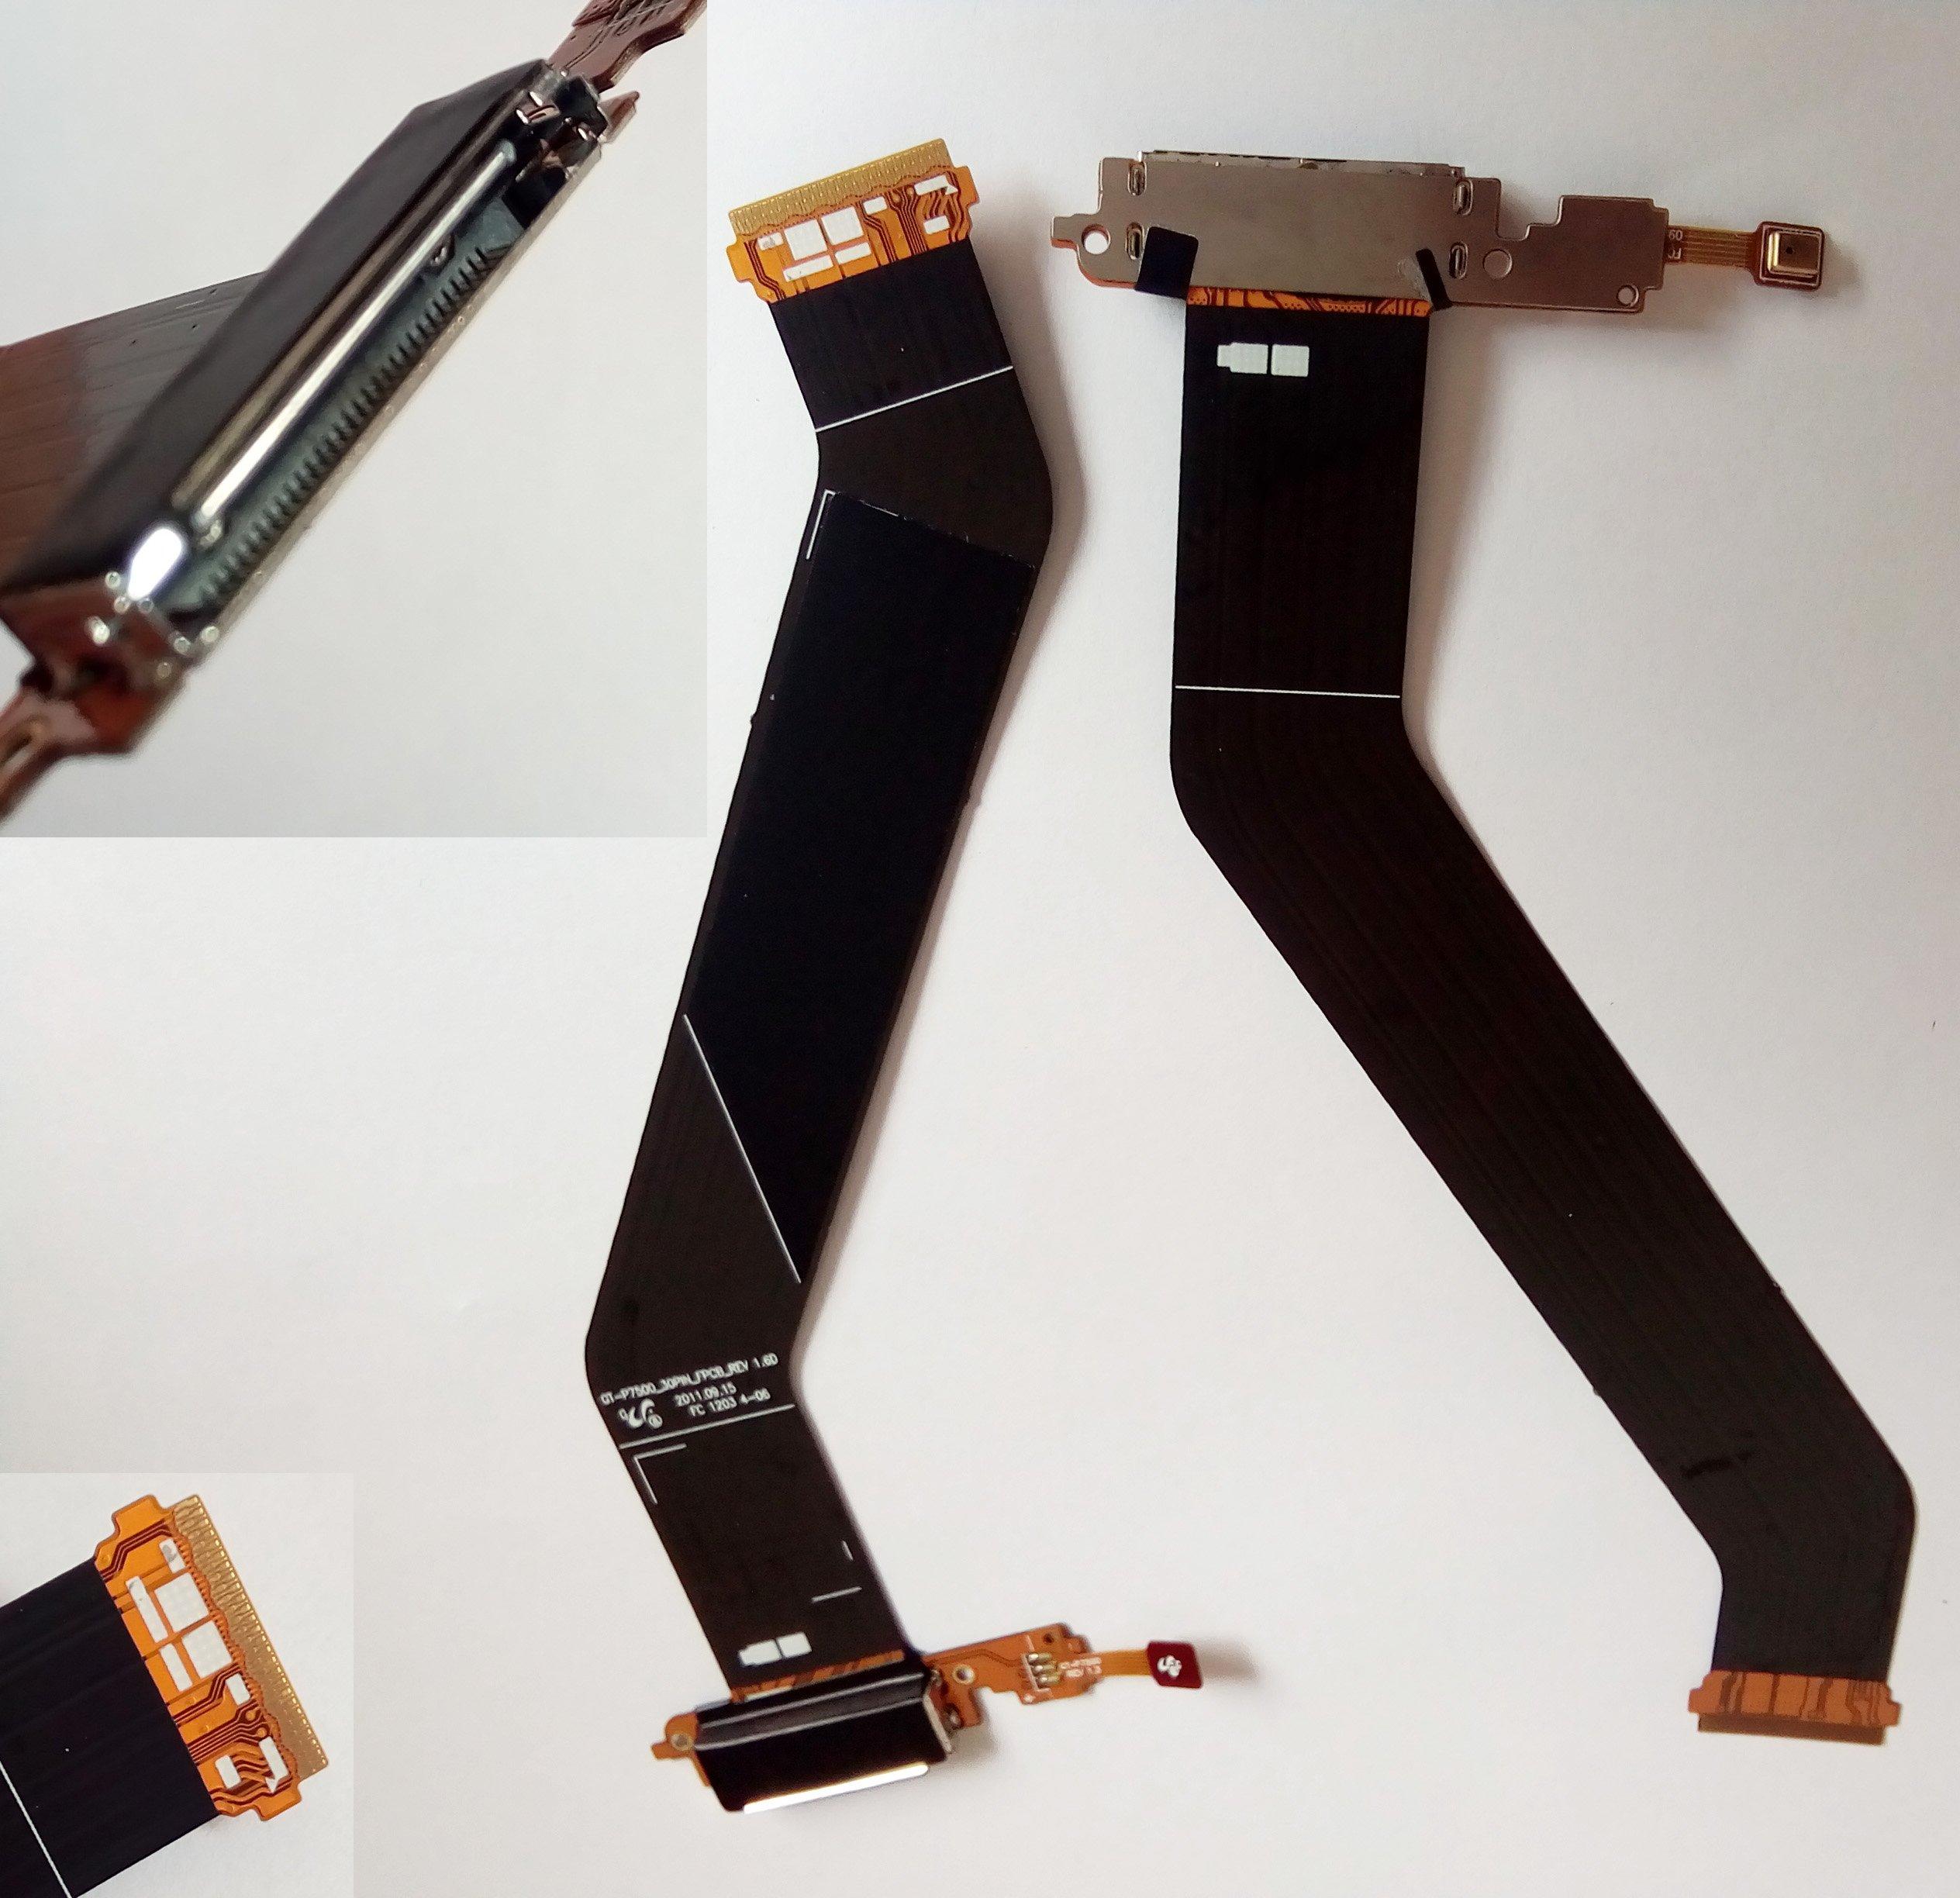 Charging Port Flex Cable for Samsung Tab 10.1 P7500 P7510 Verizon SCH-i905 Tab 2 P5100 P5110 P5113 P3100